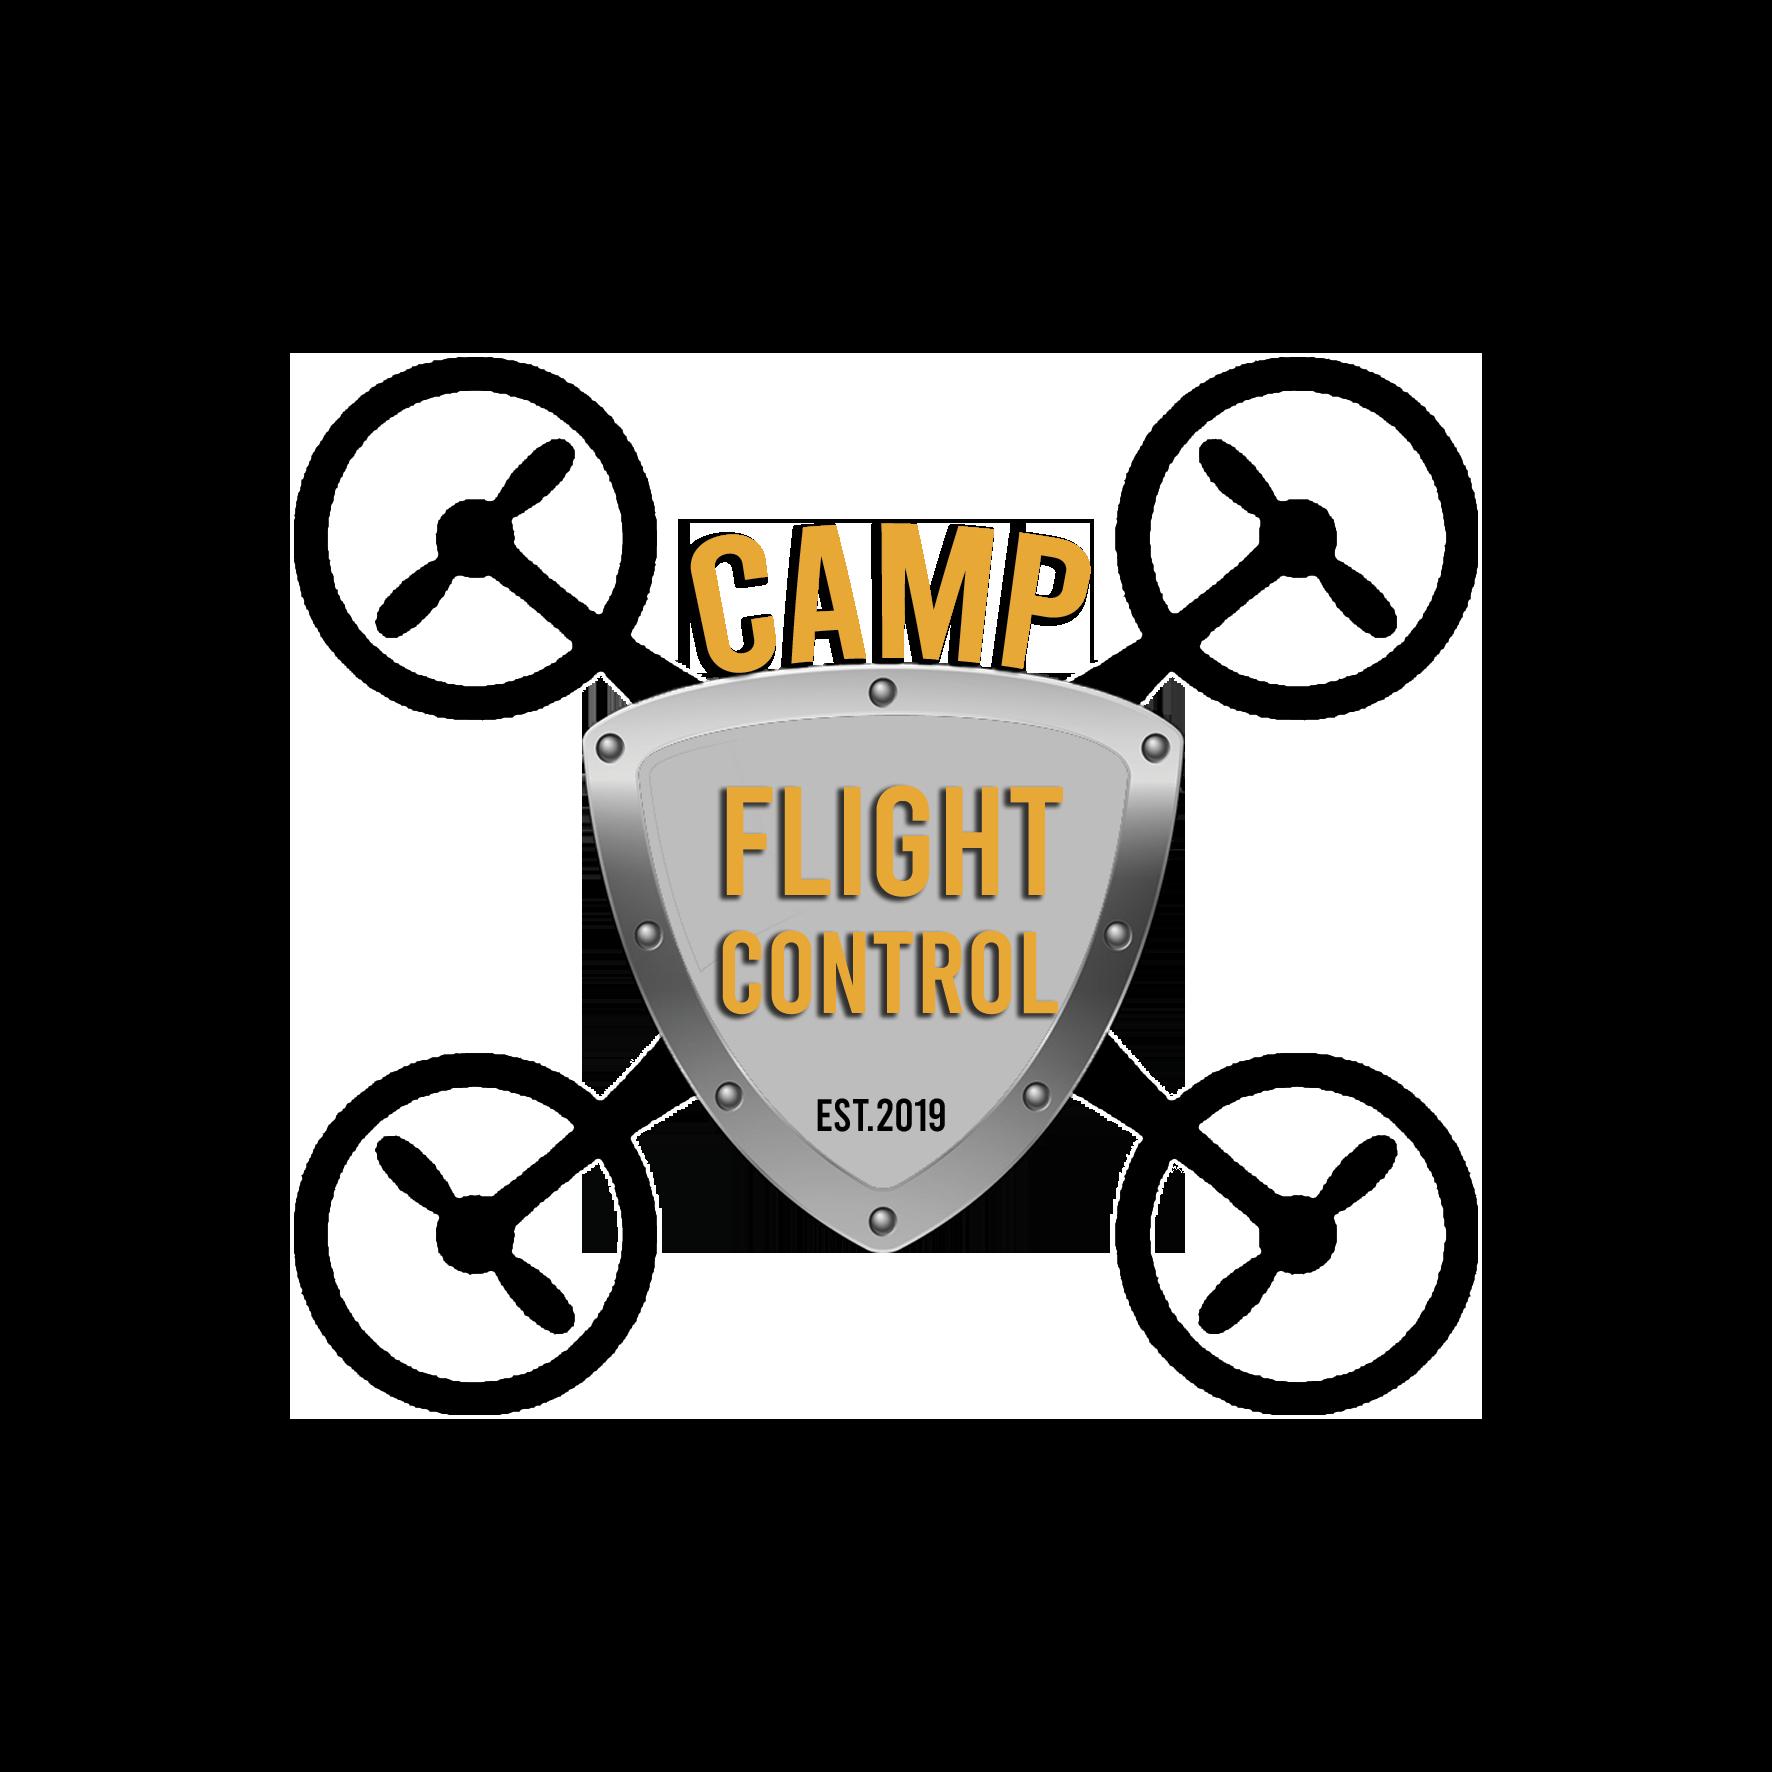 Camp Flight Control